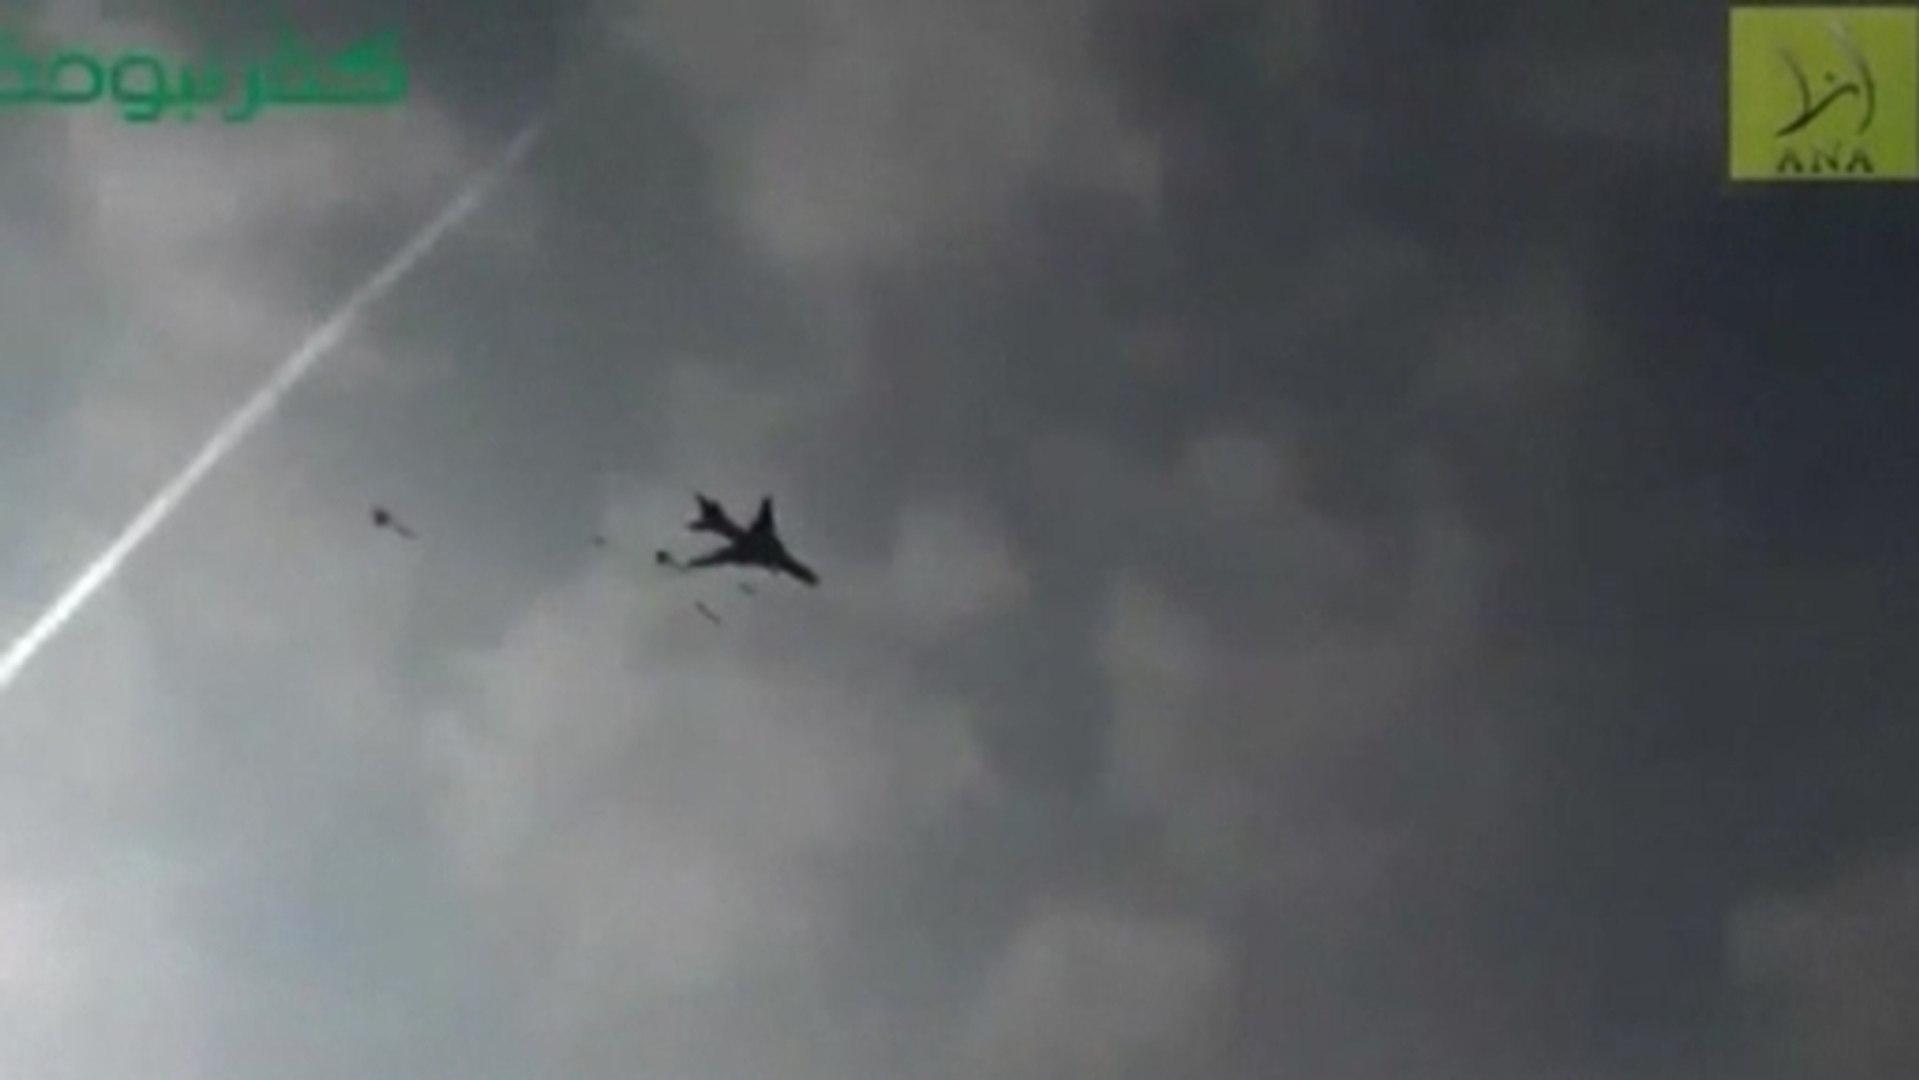 Syria air strike caught on camera